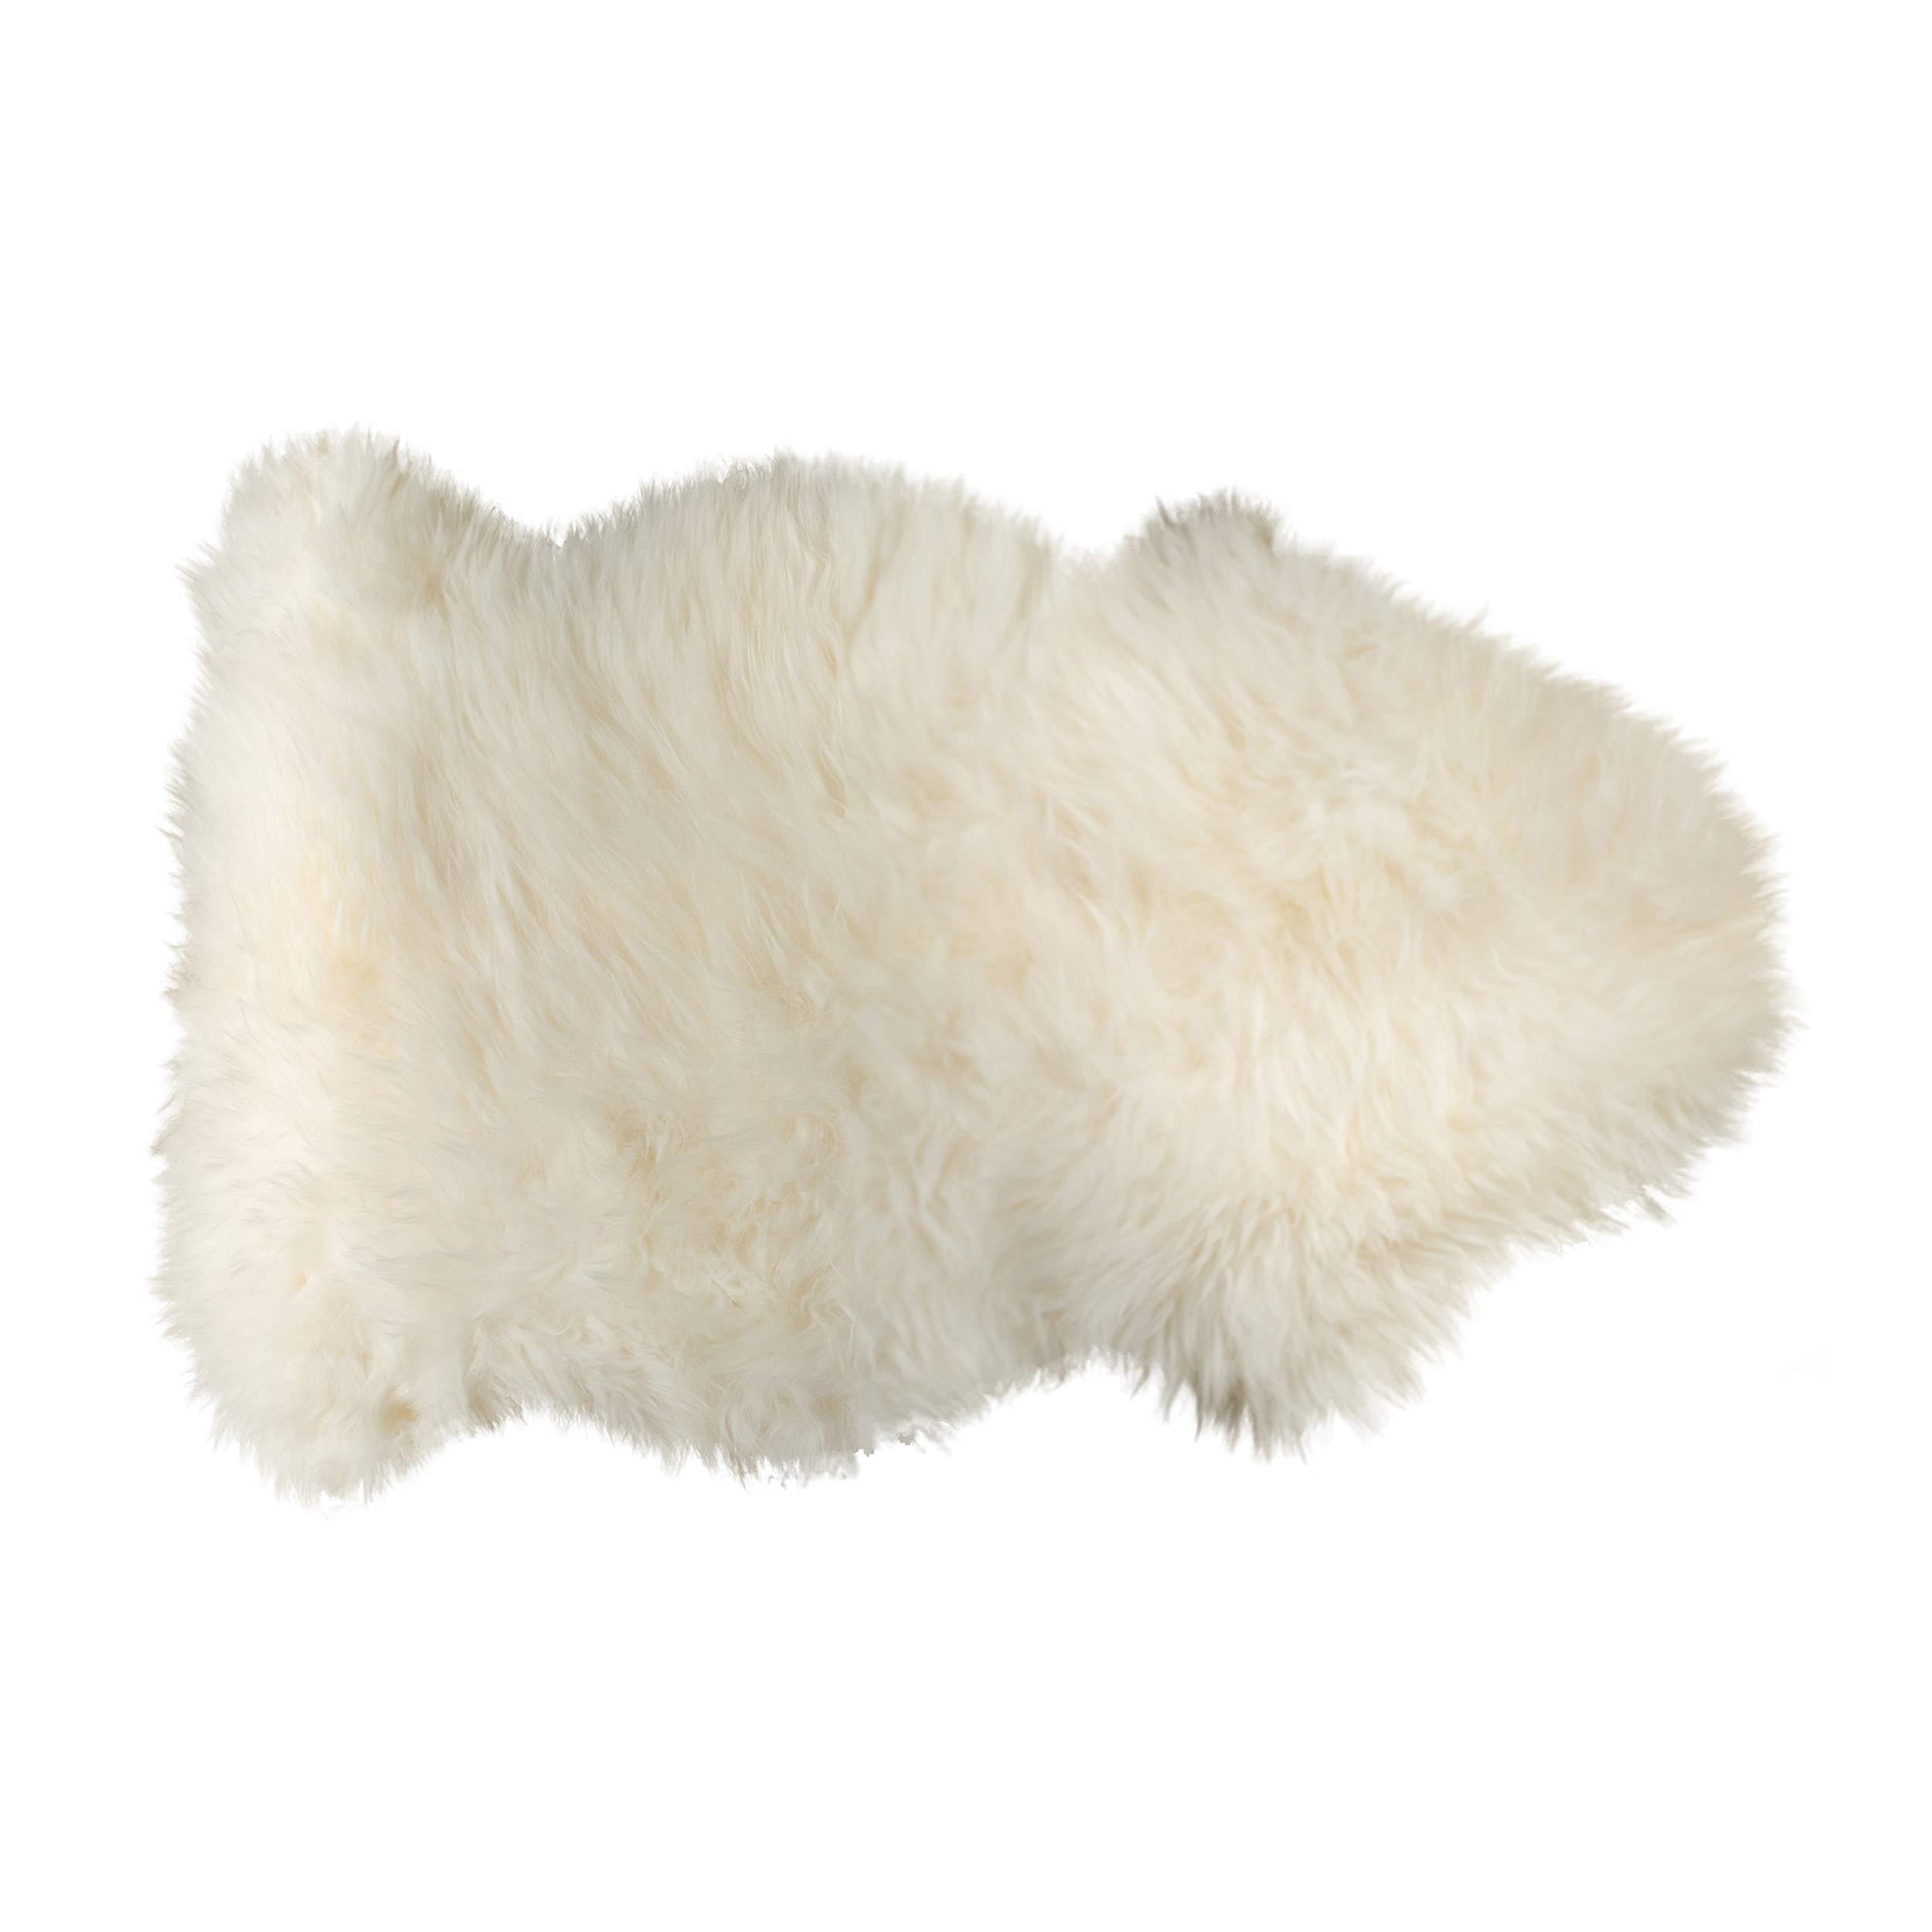 Natural 100% New Zealand Sheepskin Single Aprox 2'X3' Natural